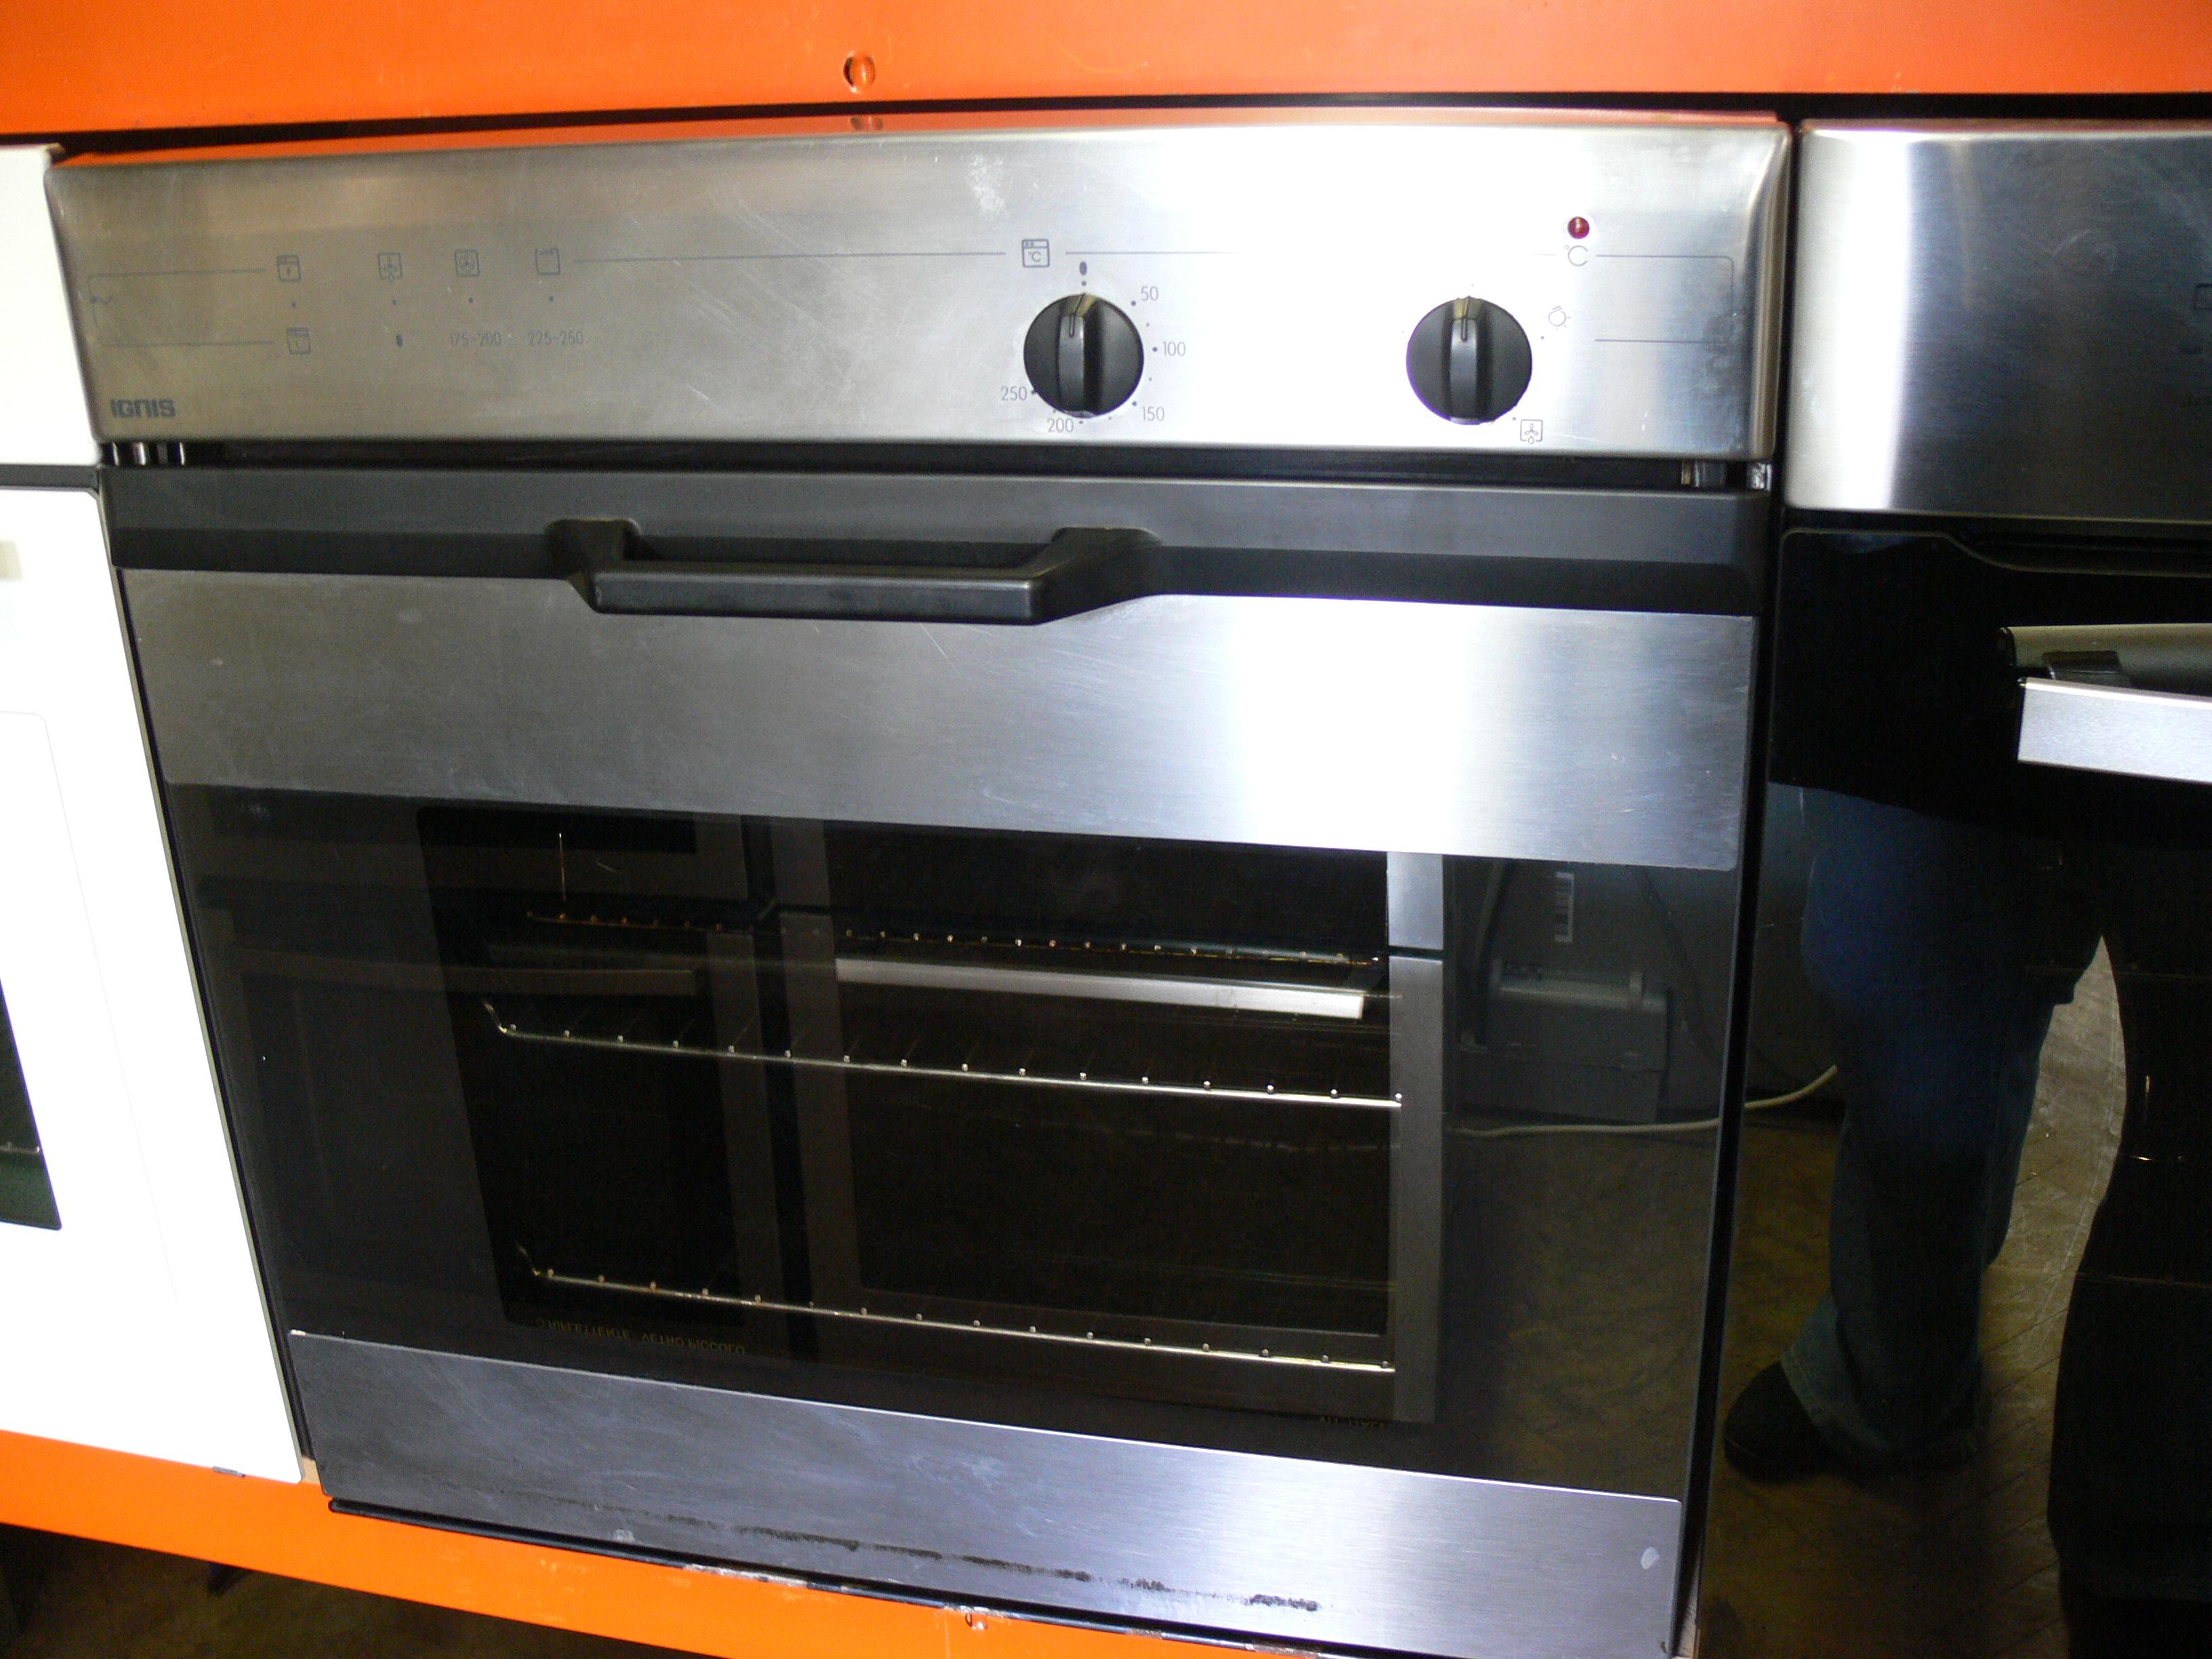 Uncategorized Kitchen Appliances Nottingham arda affordable refurbished domestic appliances gotham nottingham ignis akl436 001 jpg